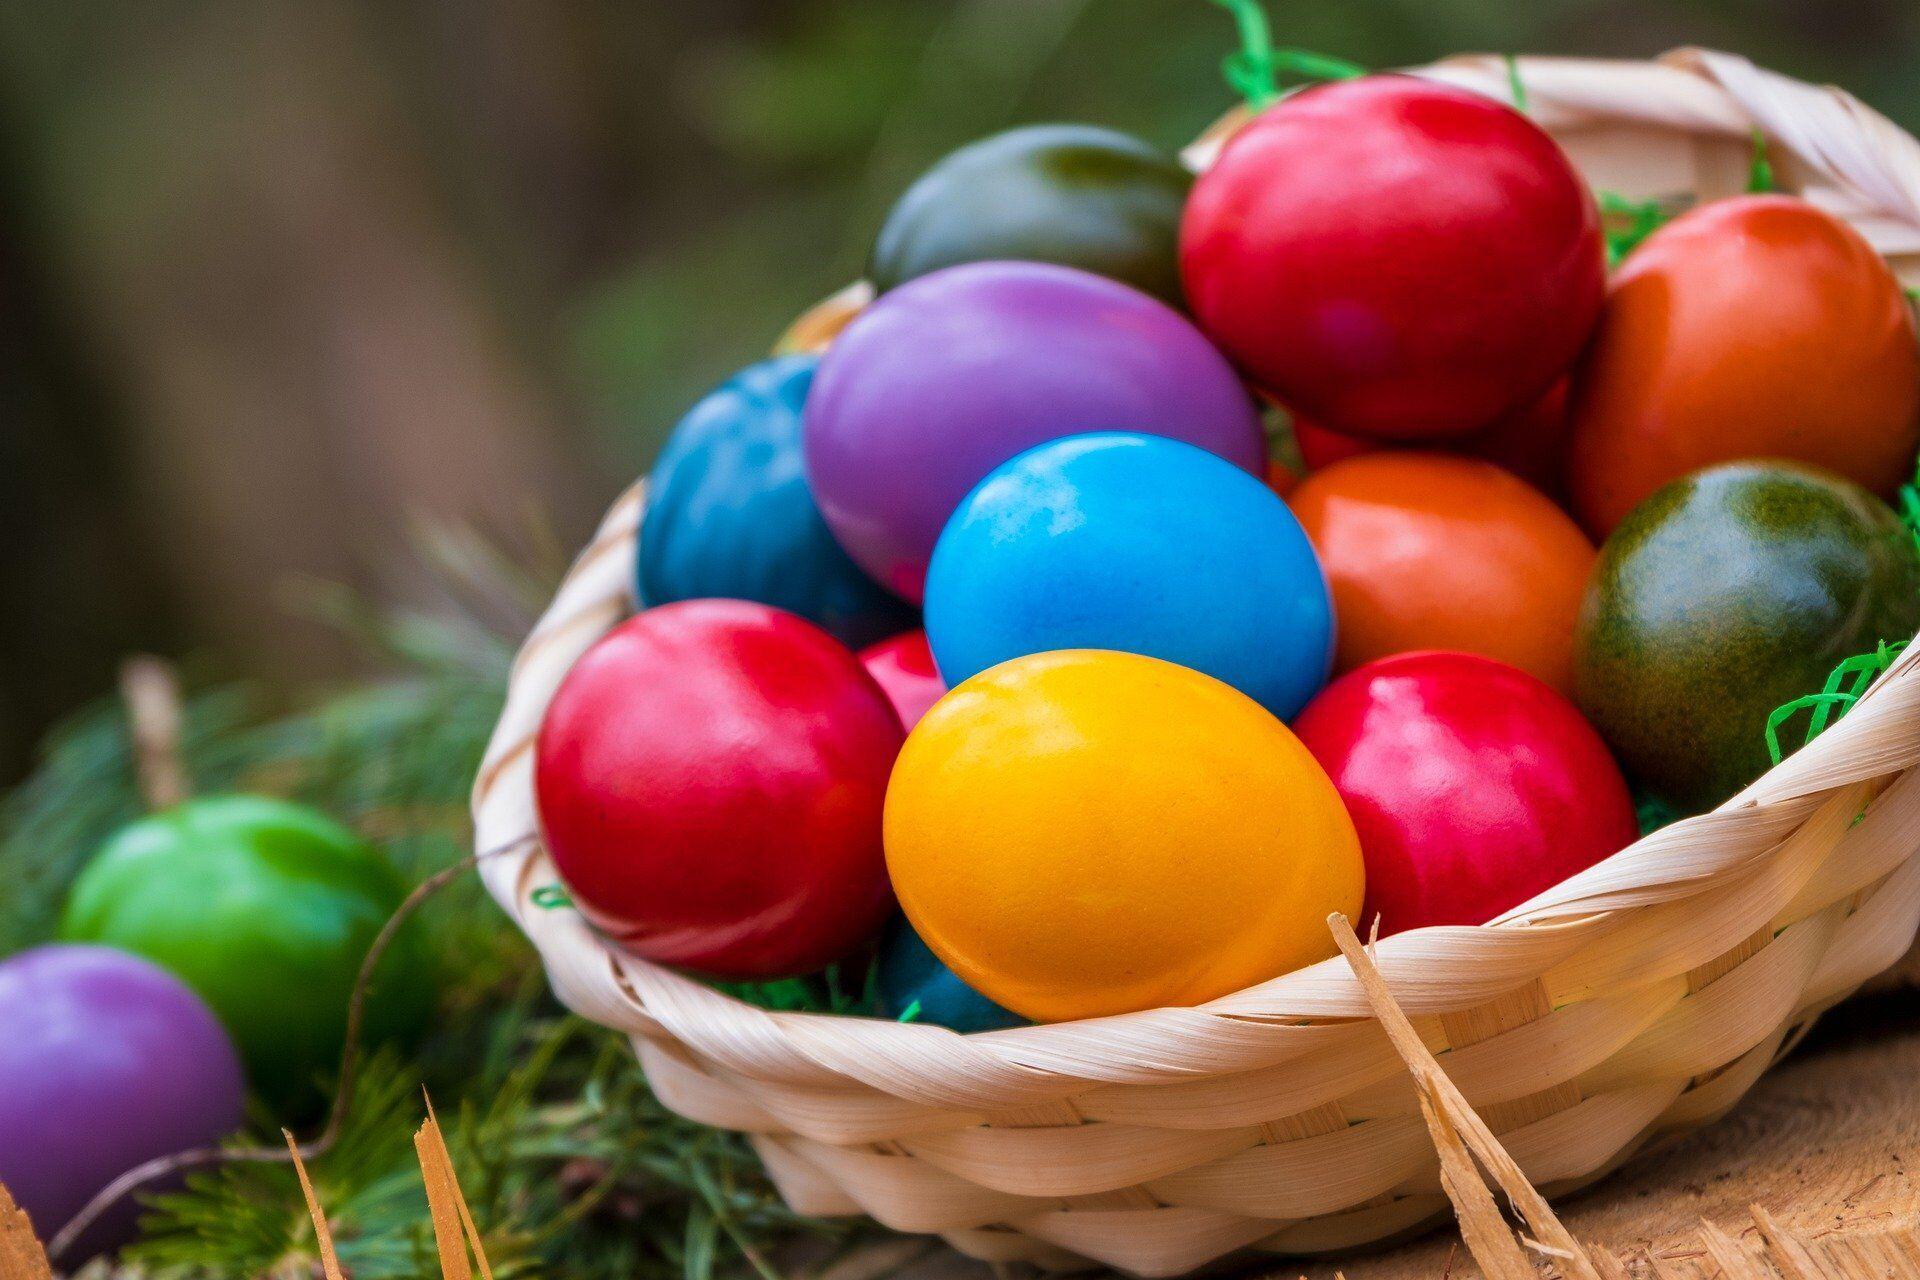 У Польщі святкування Великодня схоже на наше